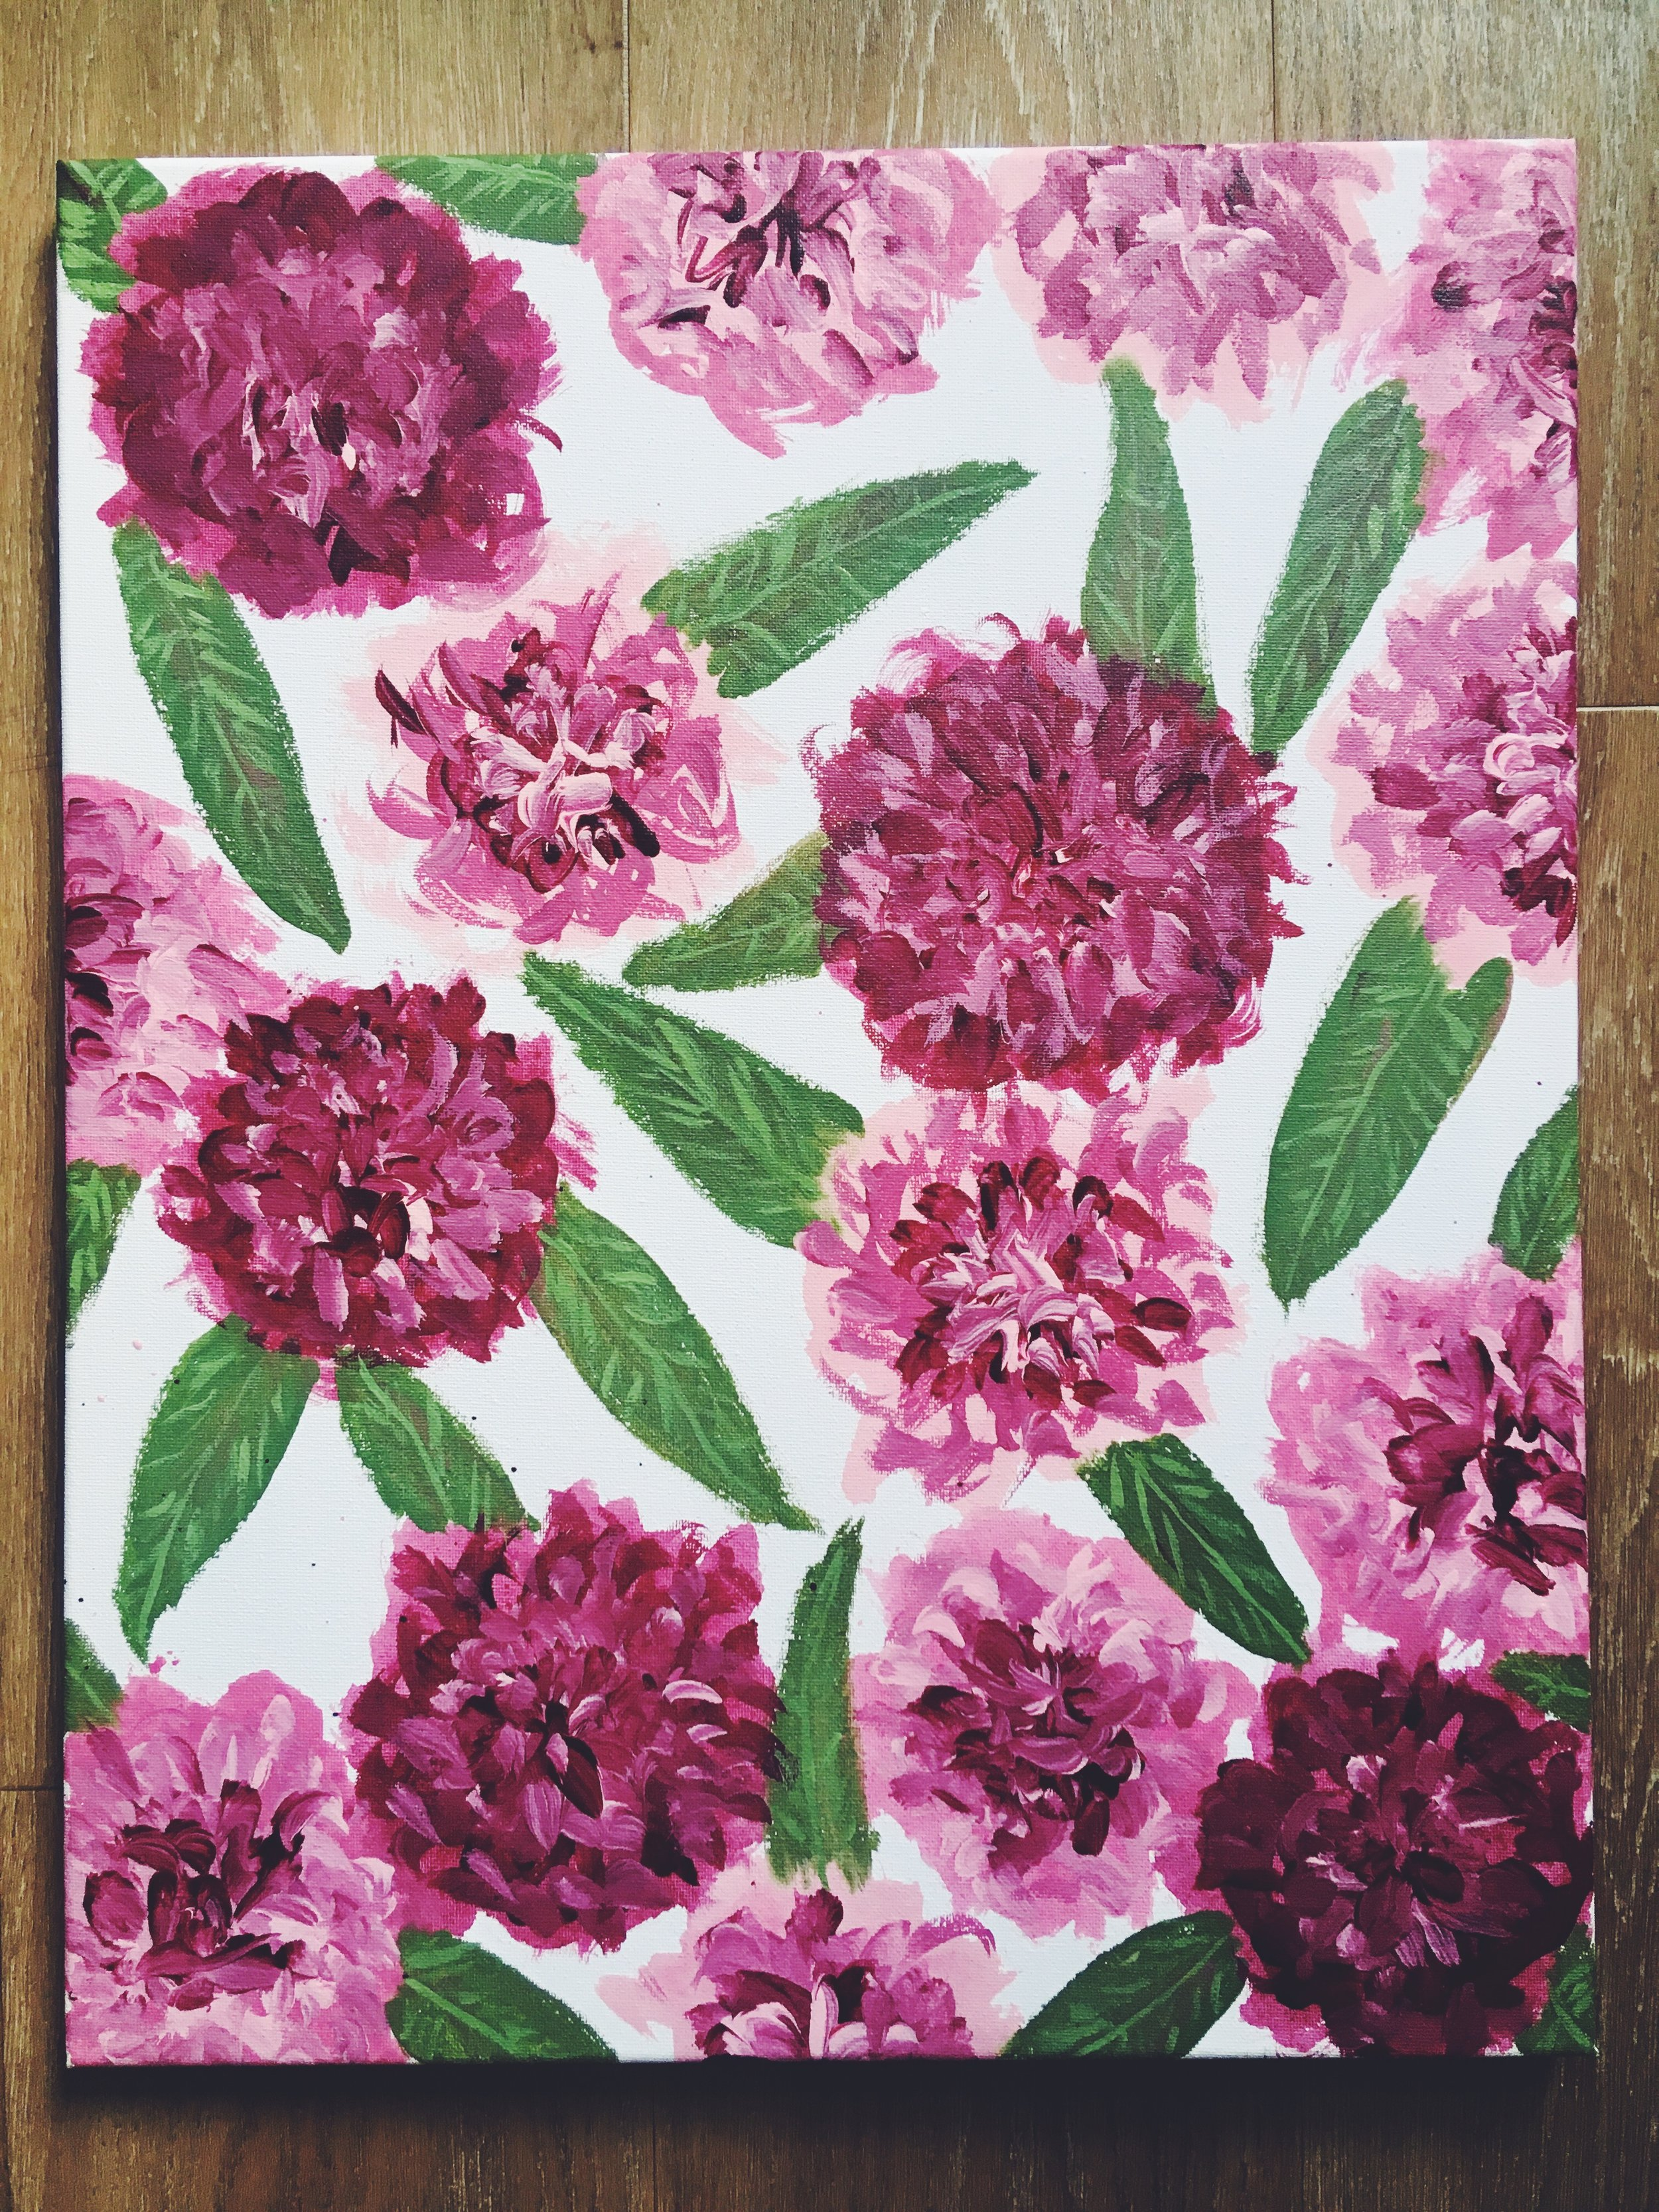 edward kwan hand painted floral bow ties melbourne australia.JPG